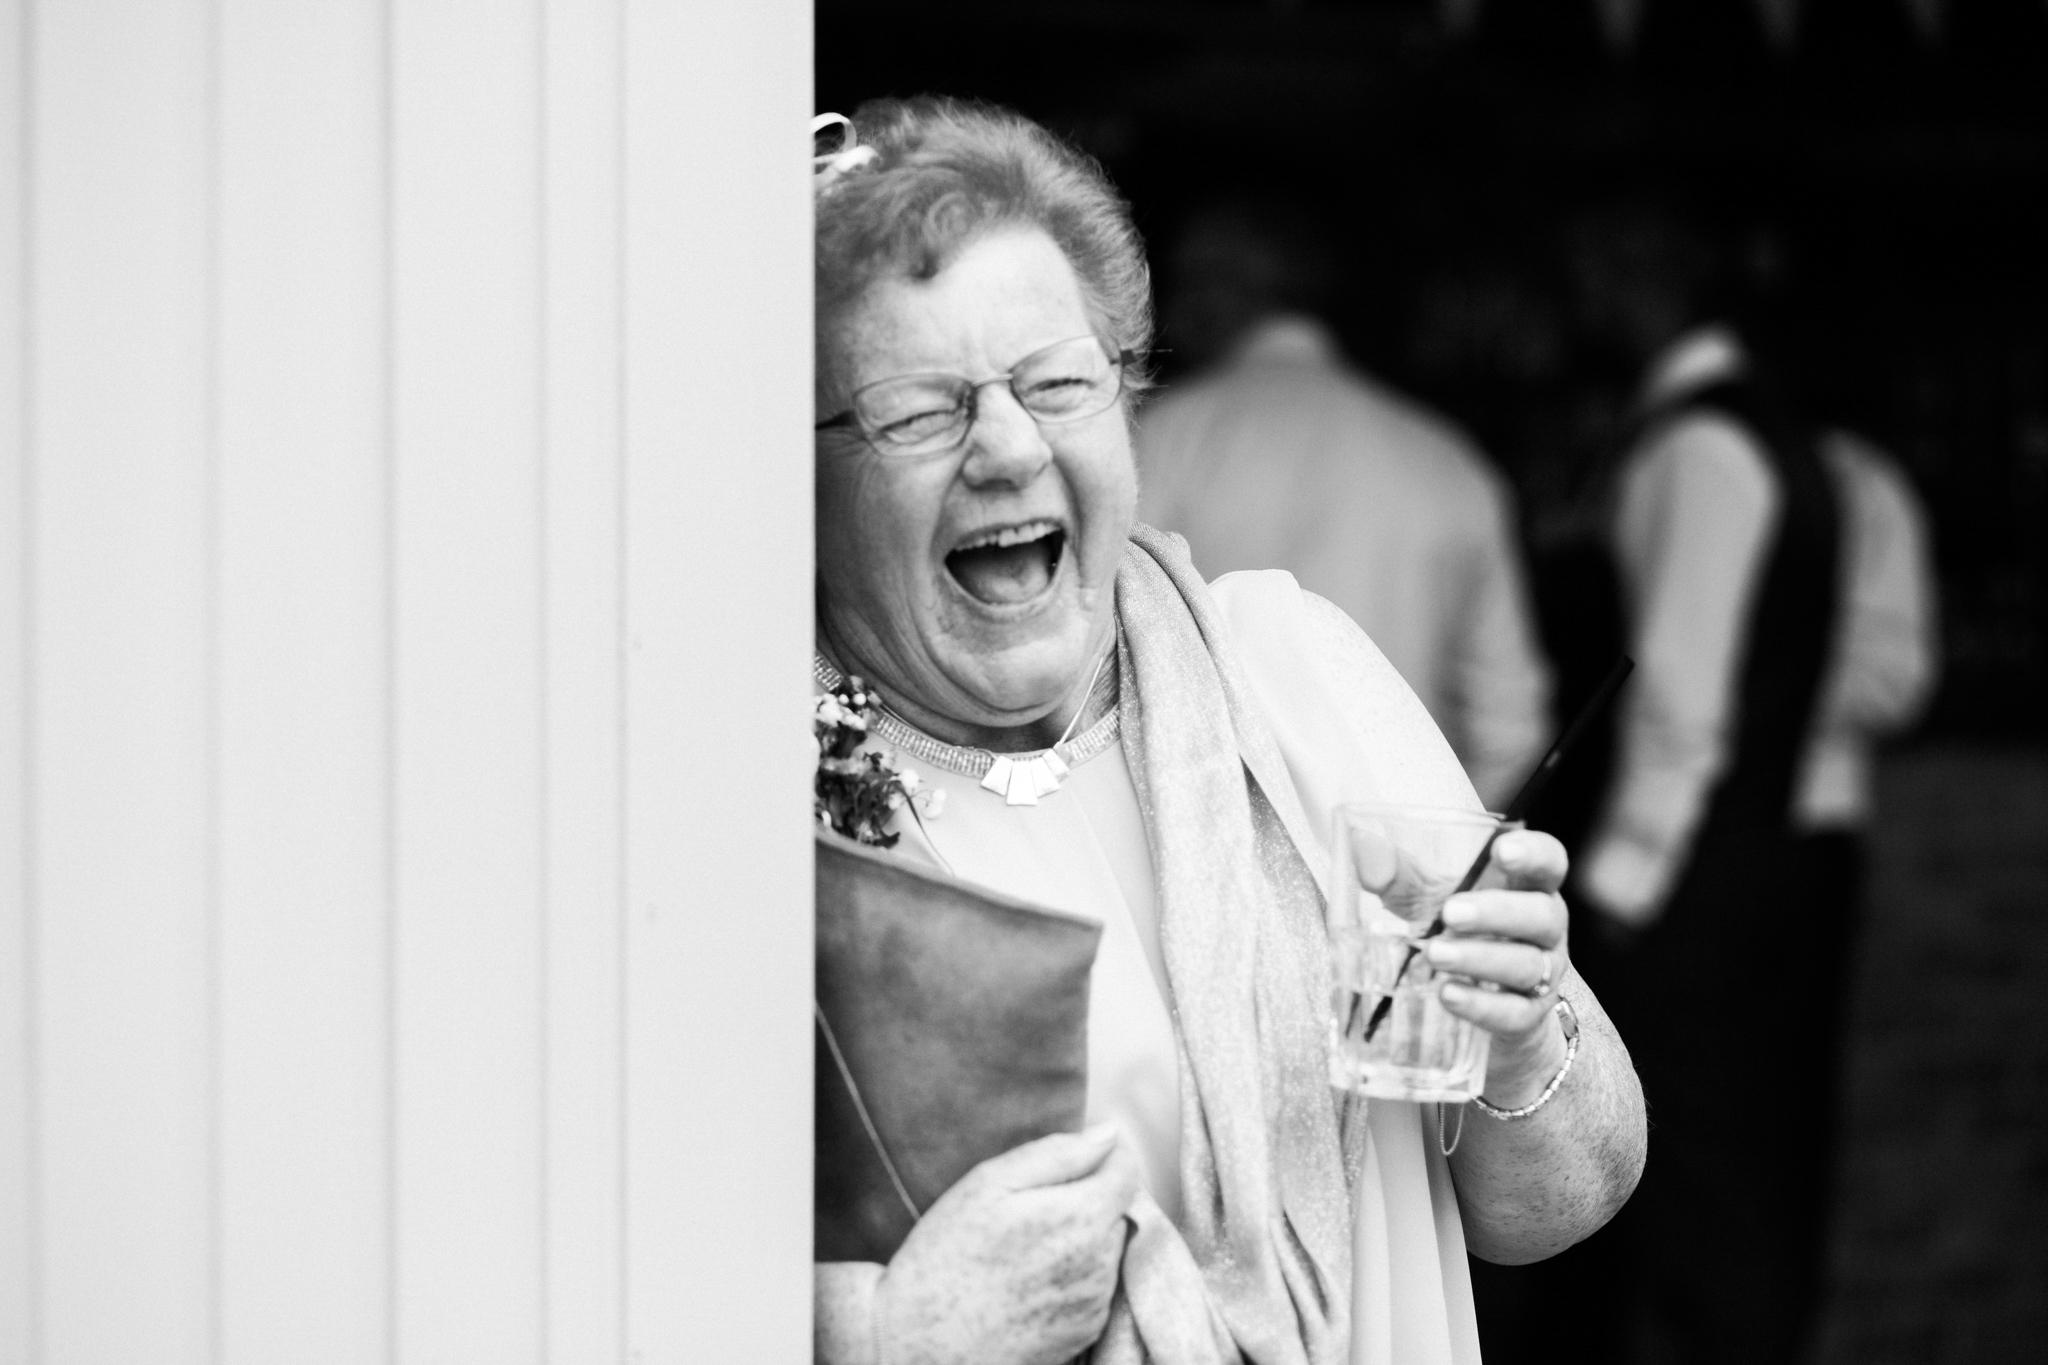 Rowsie & Lee, Swallows Nest Barn Wedding, Cotswold wedding photographer, Warwickshire Wedding Photographer-116.jpg